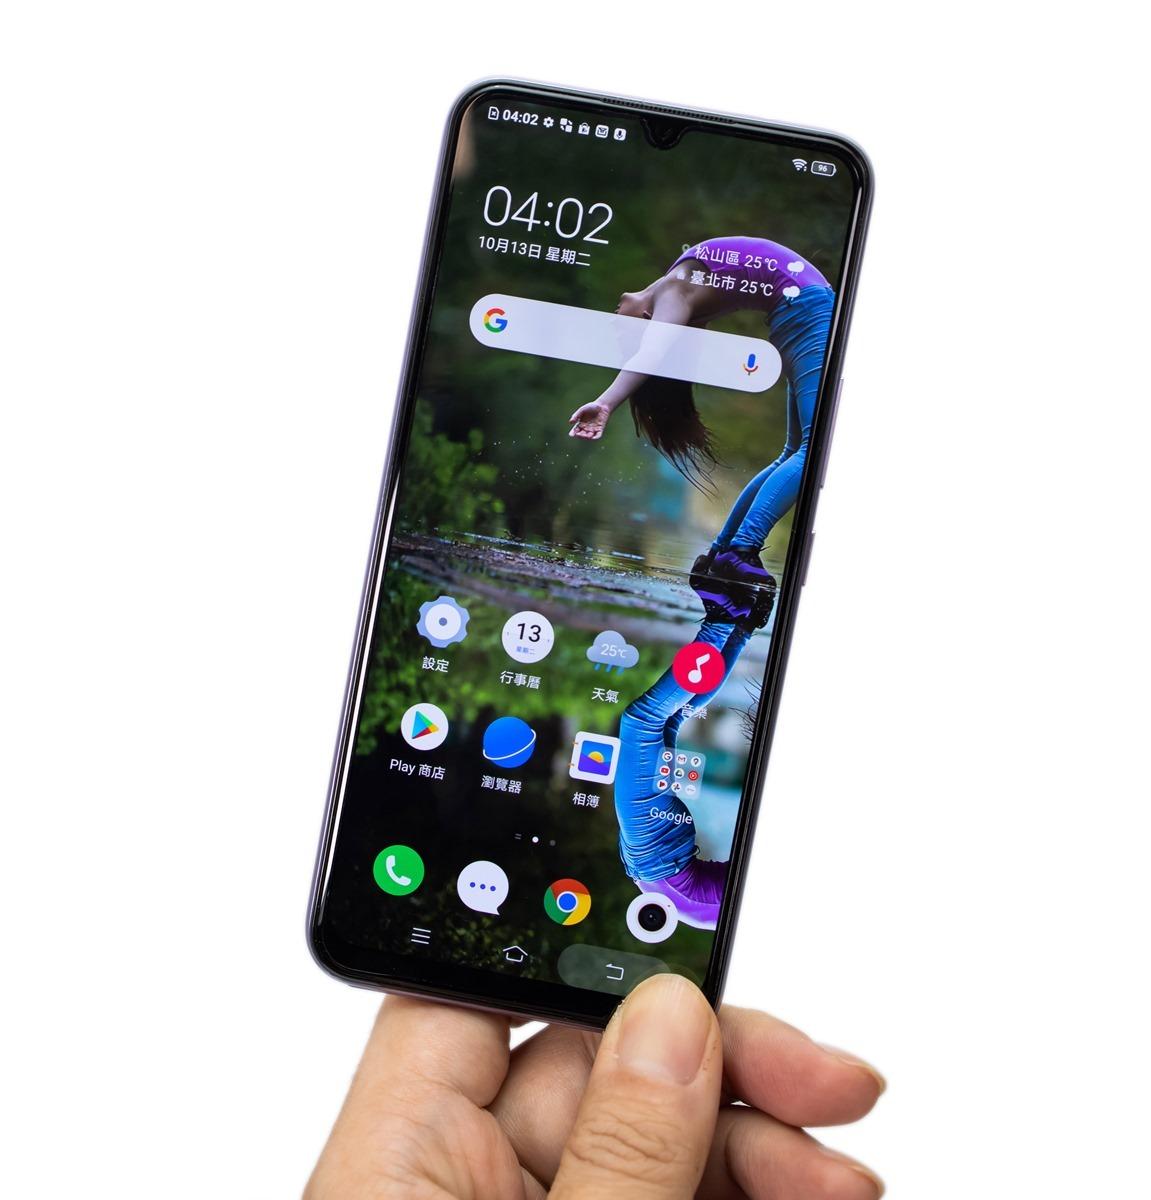 Nokia 首款 5G 手機來了!Nokia 8.3 支援 5G 最多頻段全球最好用、大螢幕四鏡頭原生 Android 體驗 @3C 達人廖阿輝